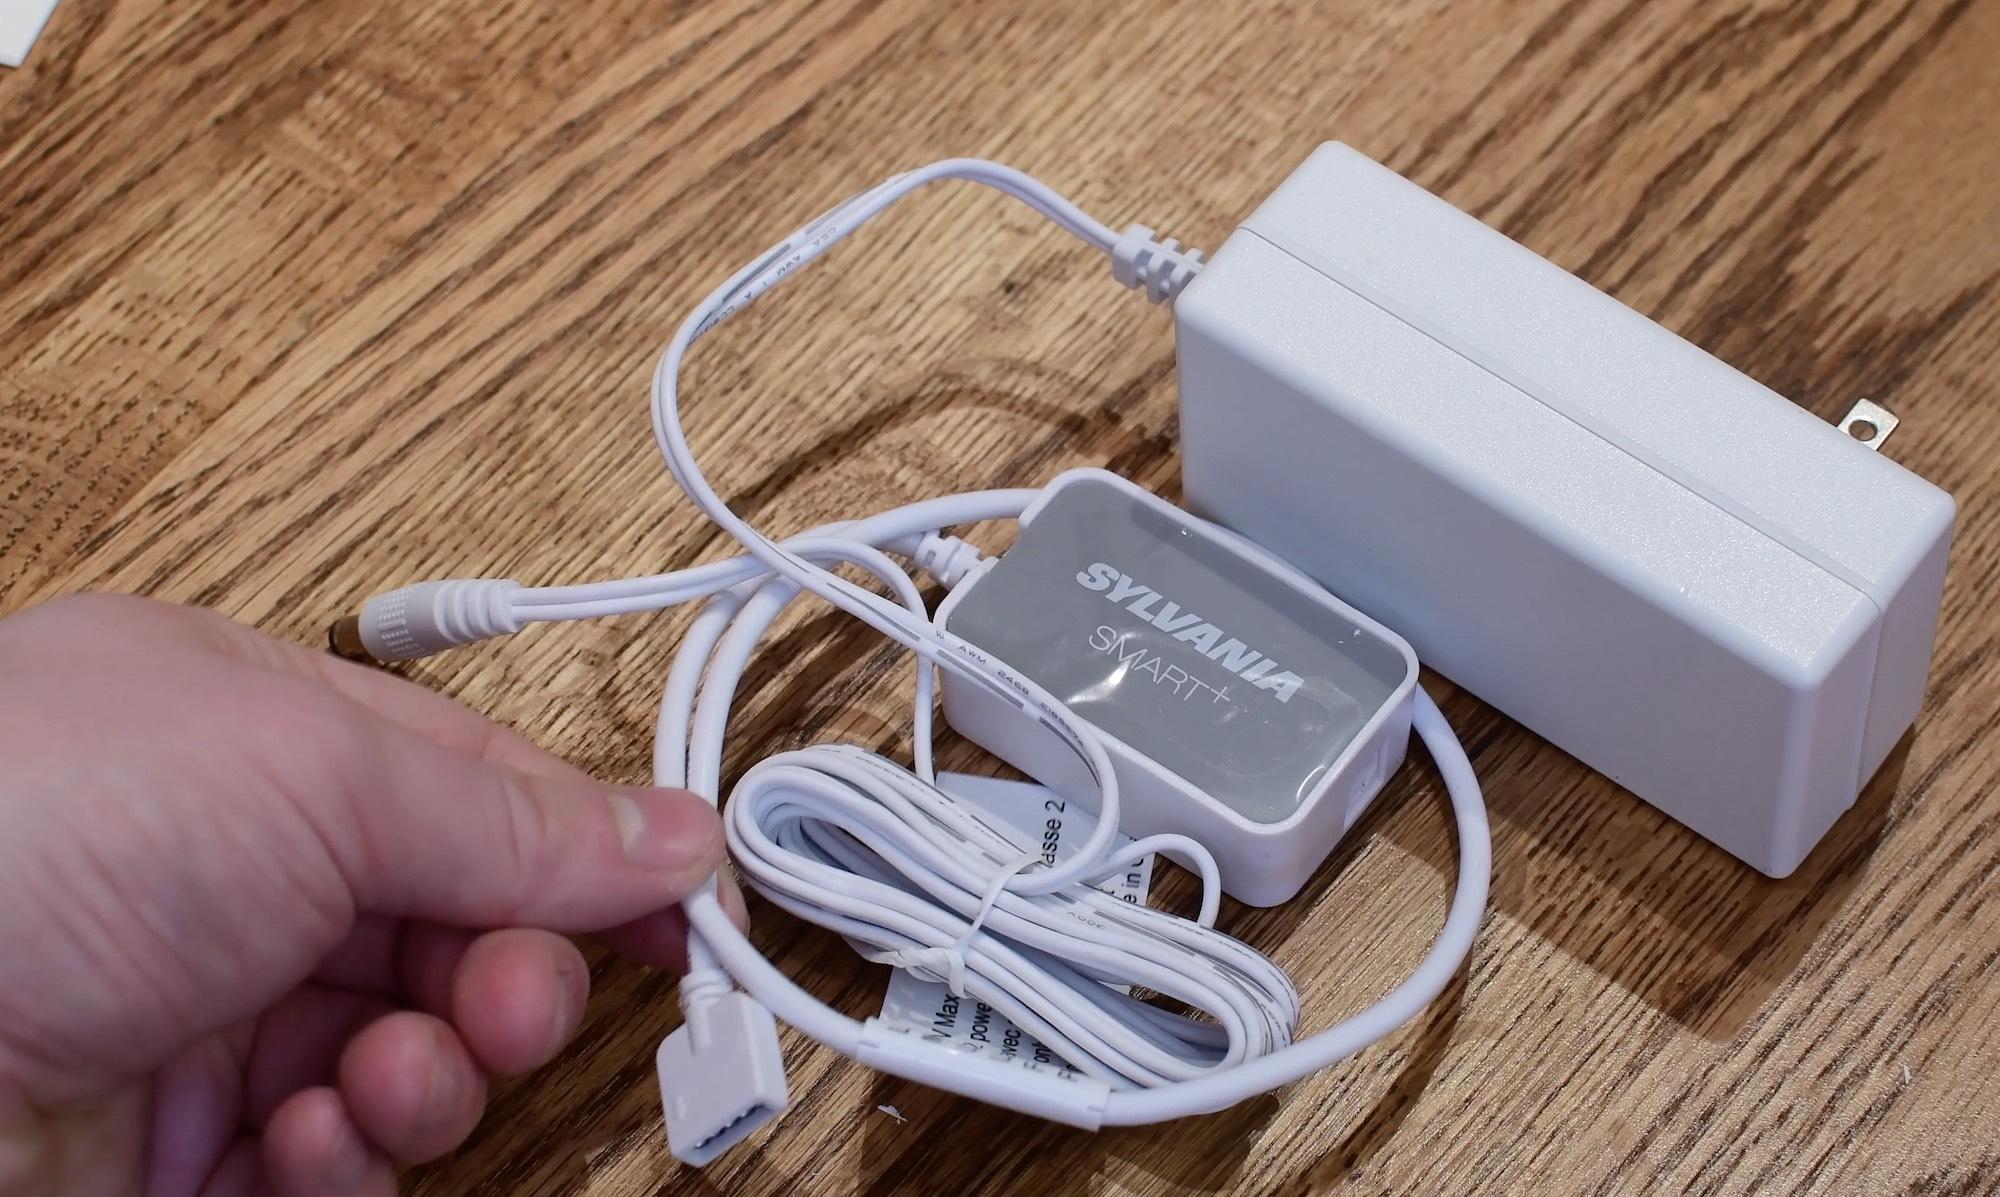 Bluetooth Full Color Indoor Smart Flex Strip Starter Kit For Apple HomeKit iOS